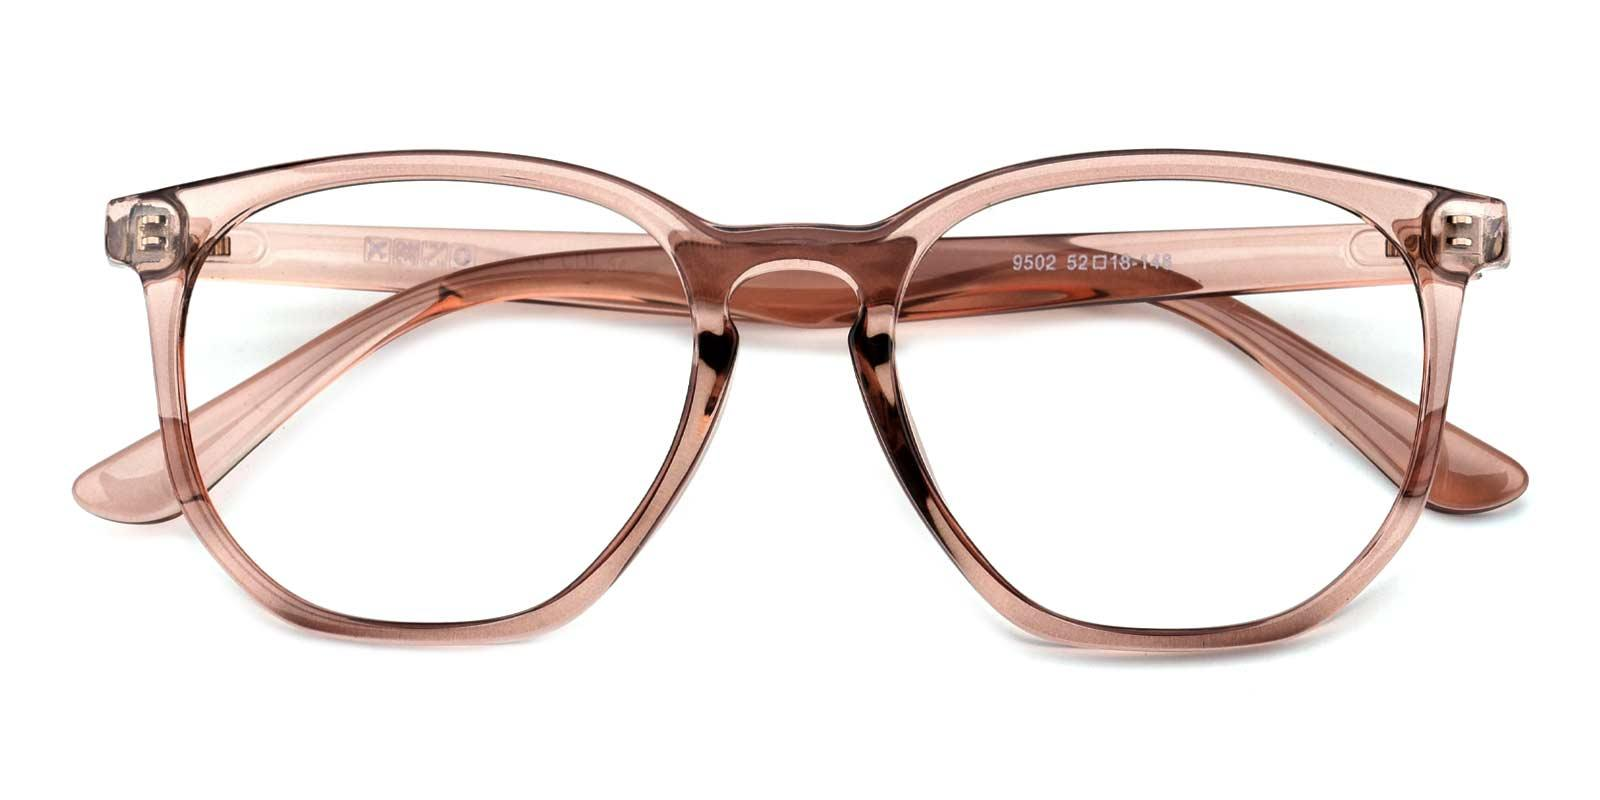 Claire-Brown-Geometric-TR-Eyeglasses-detail